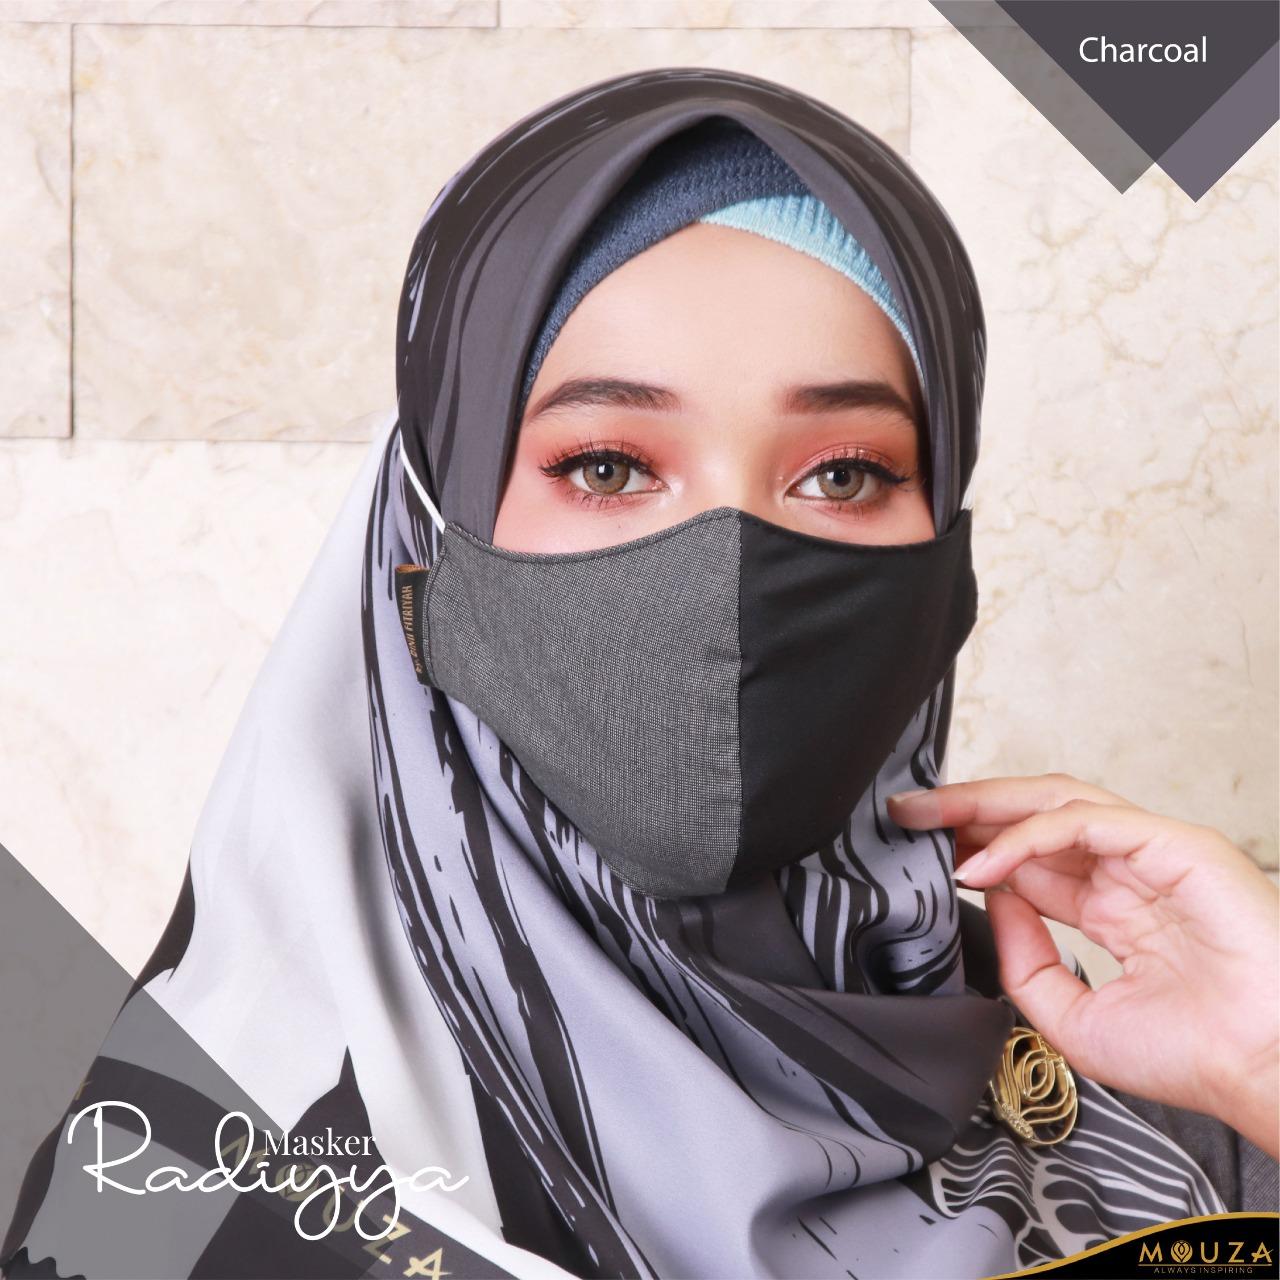 Masker Radiyya